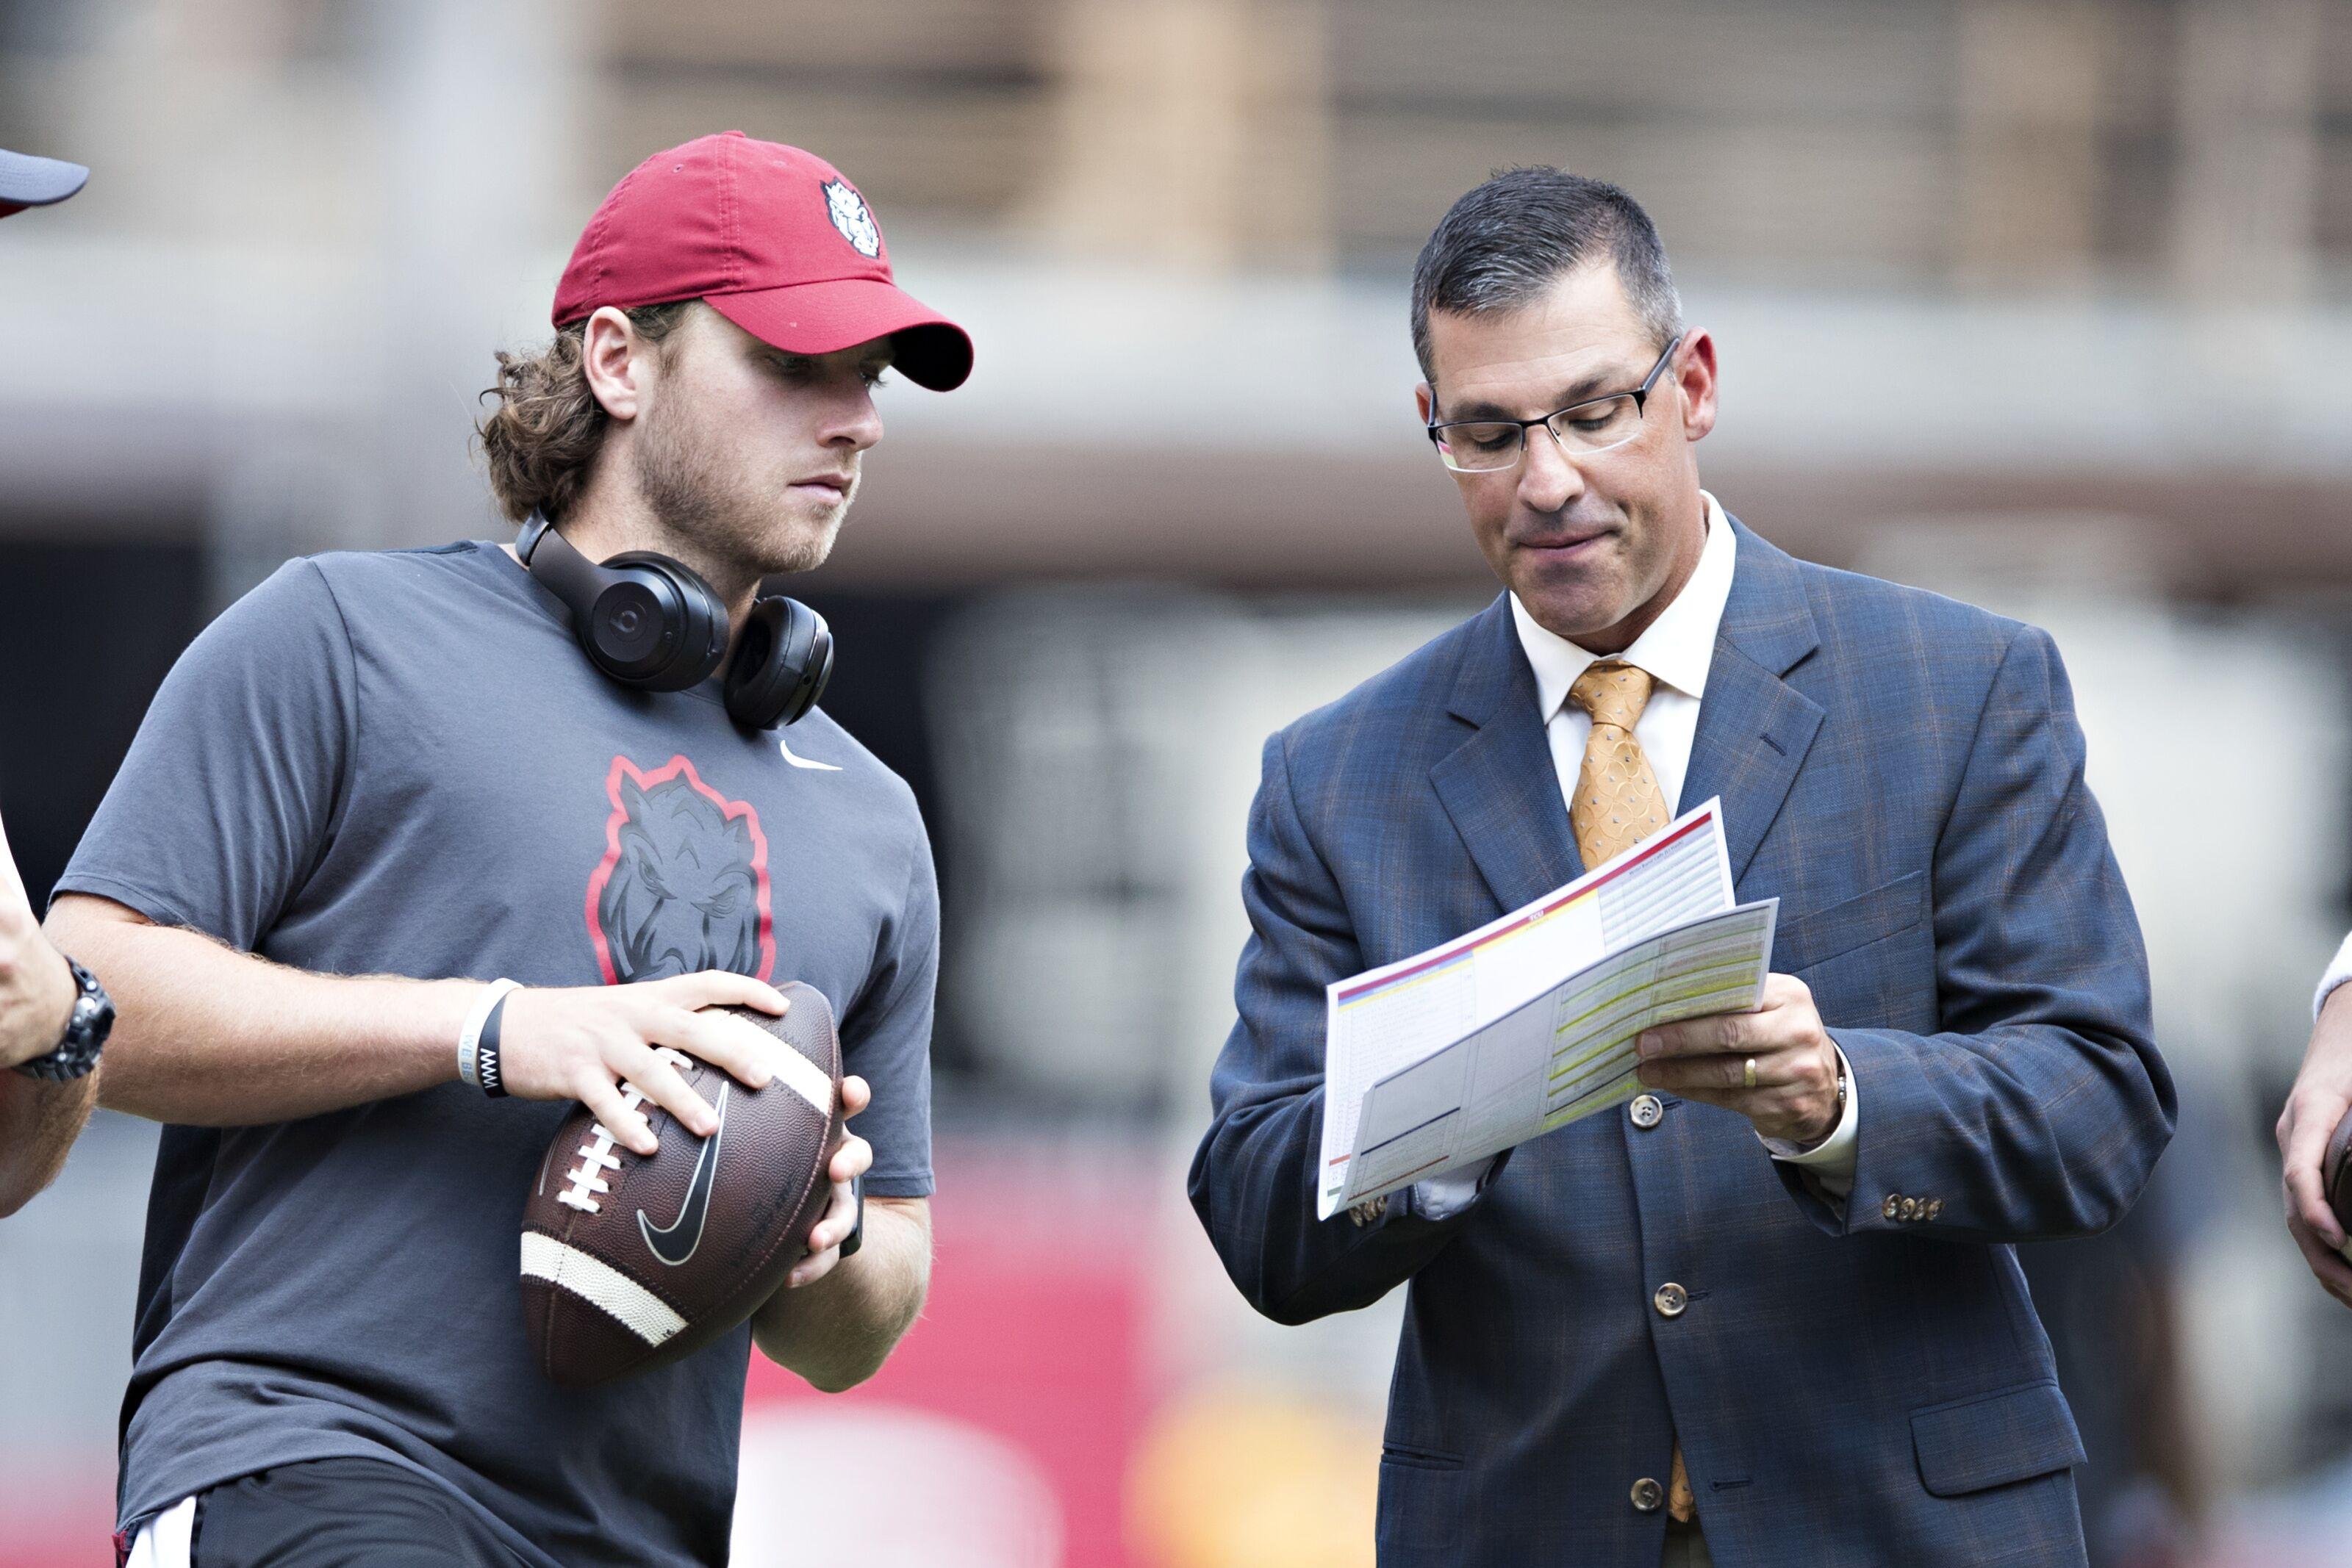 Miami football hiring UGA Coach to work with quarterbacks